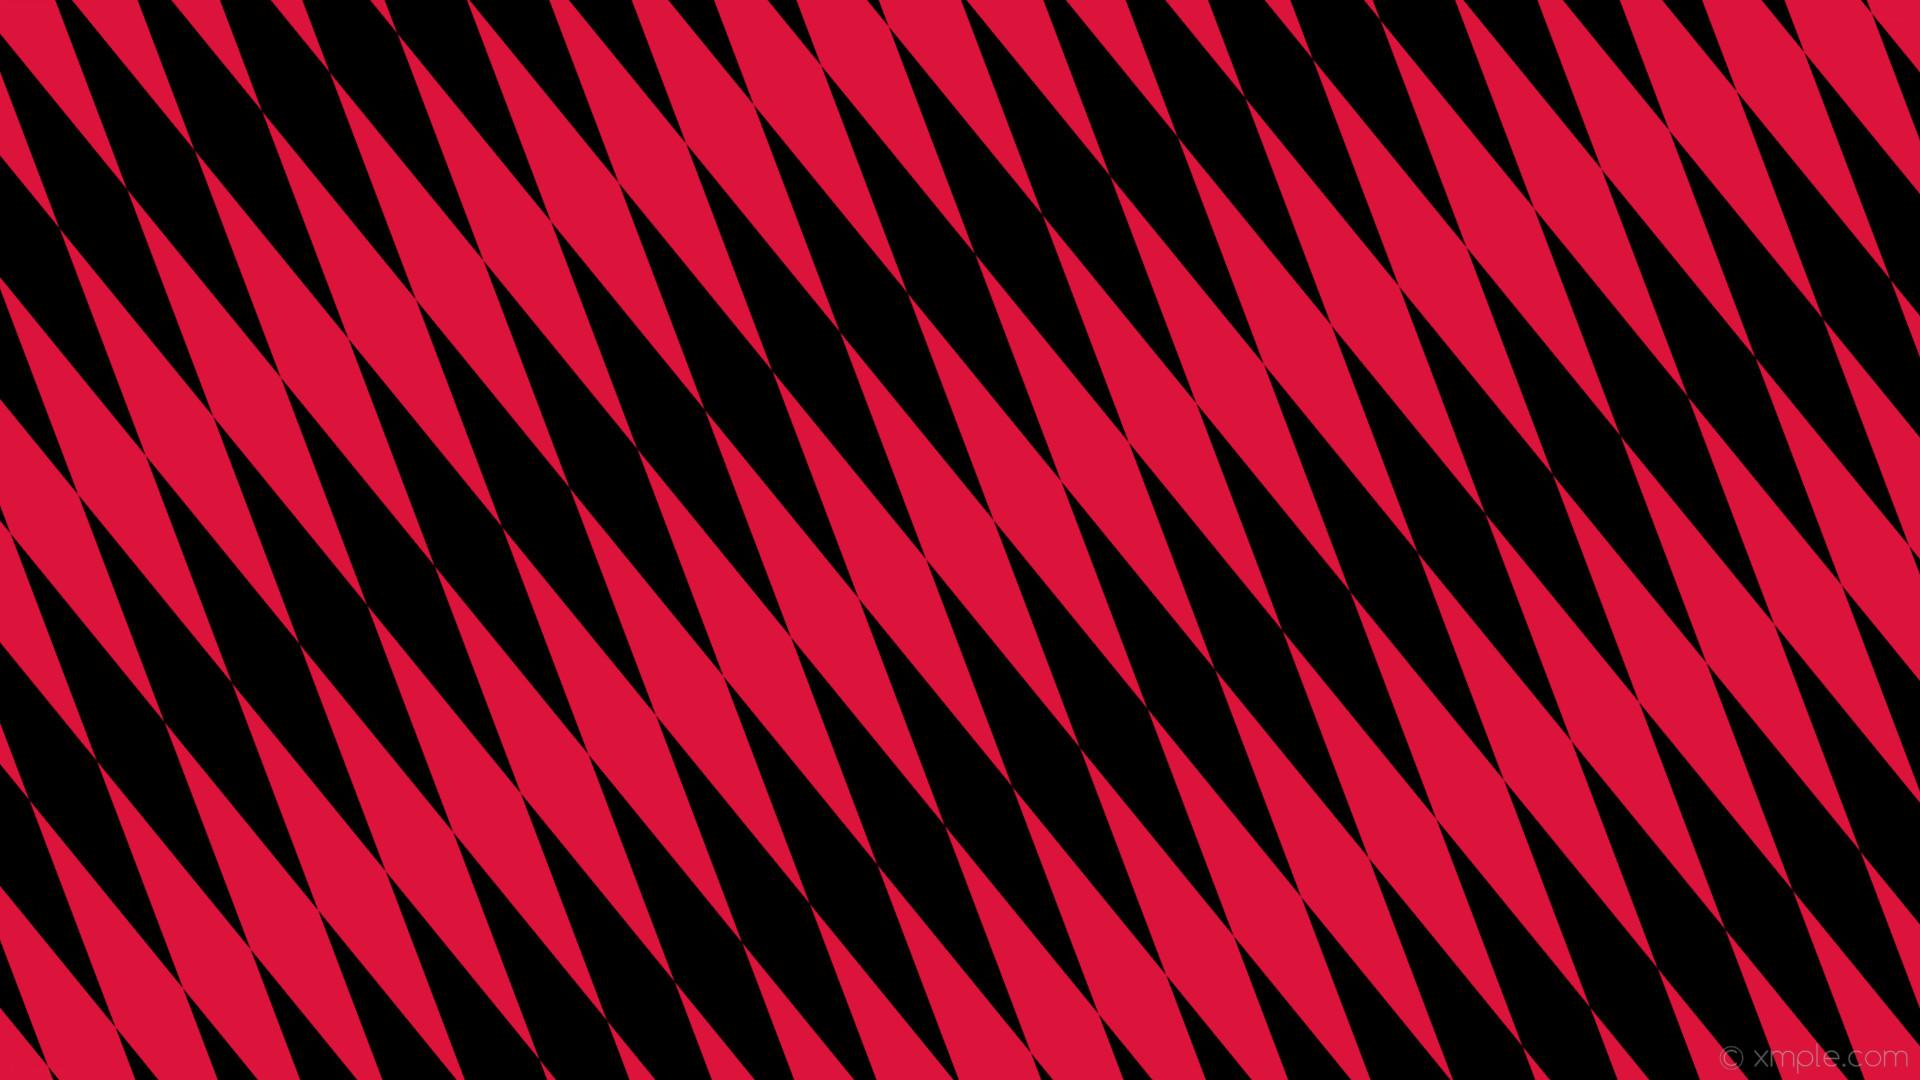 Res: 1920x1080, wallpaper black diamond rhombus lozenge red crimson #dc143c #000000 120°  480px 78px